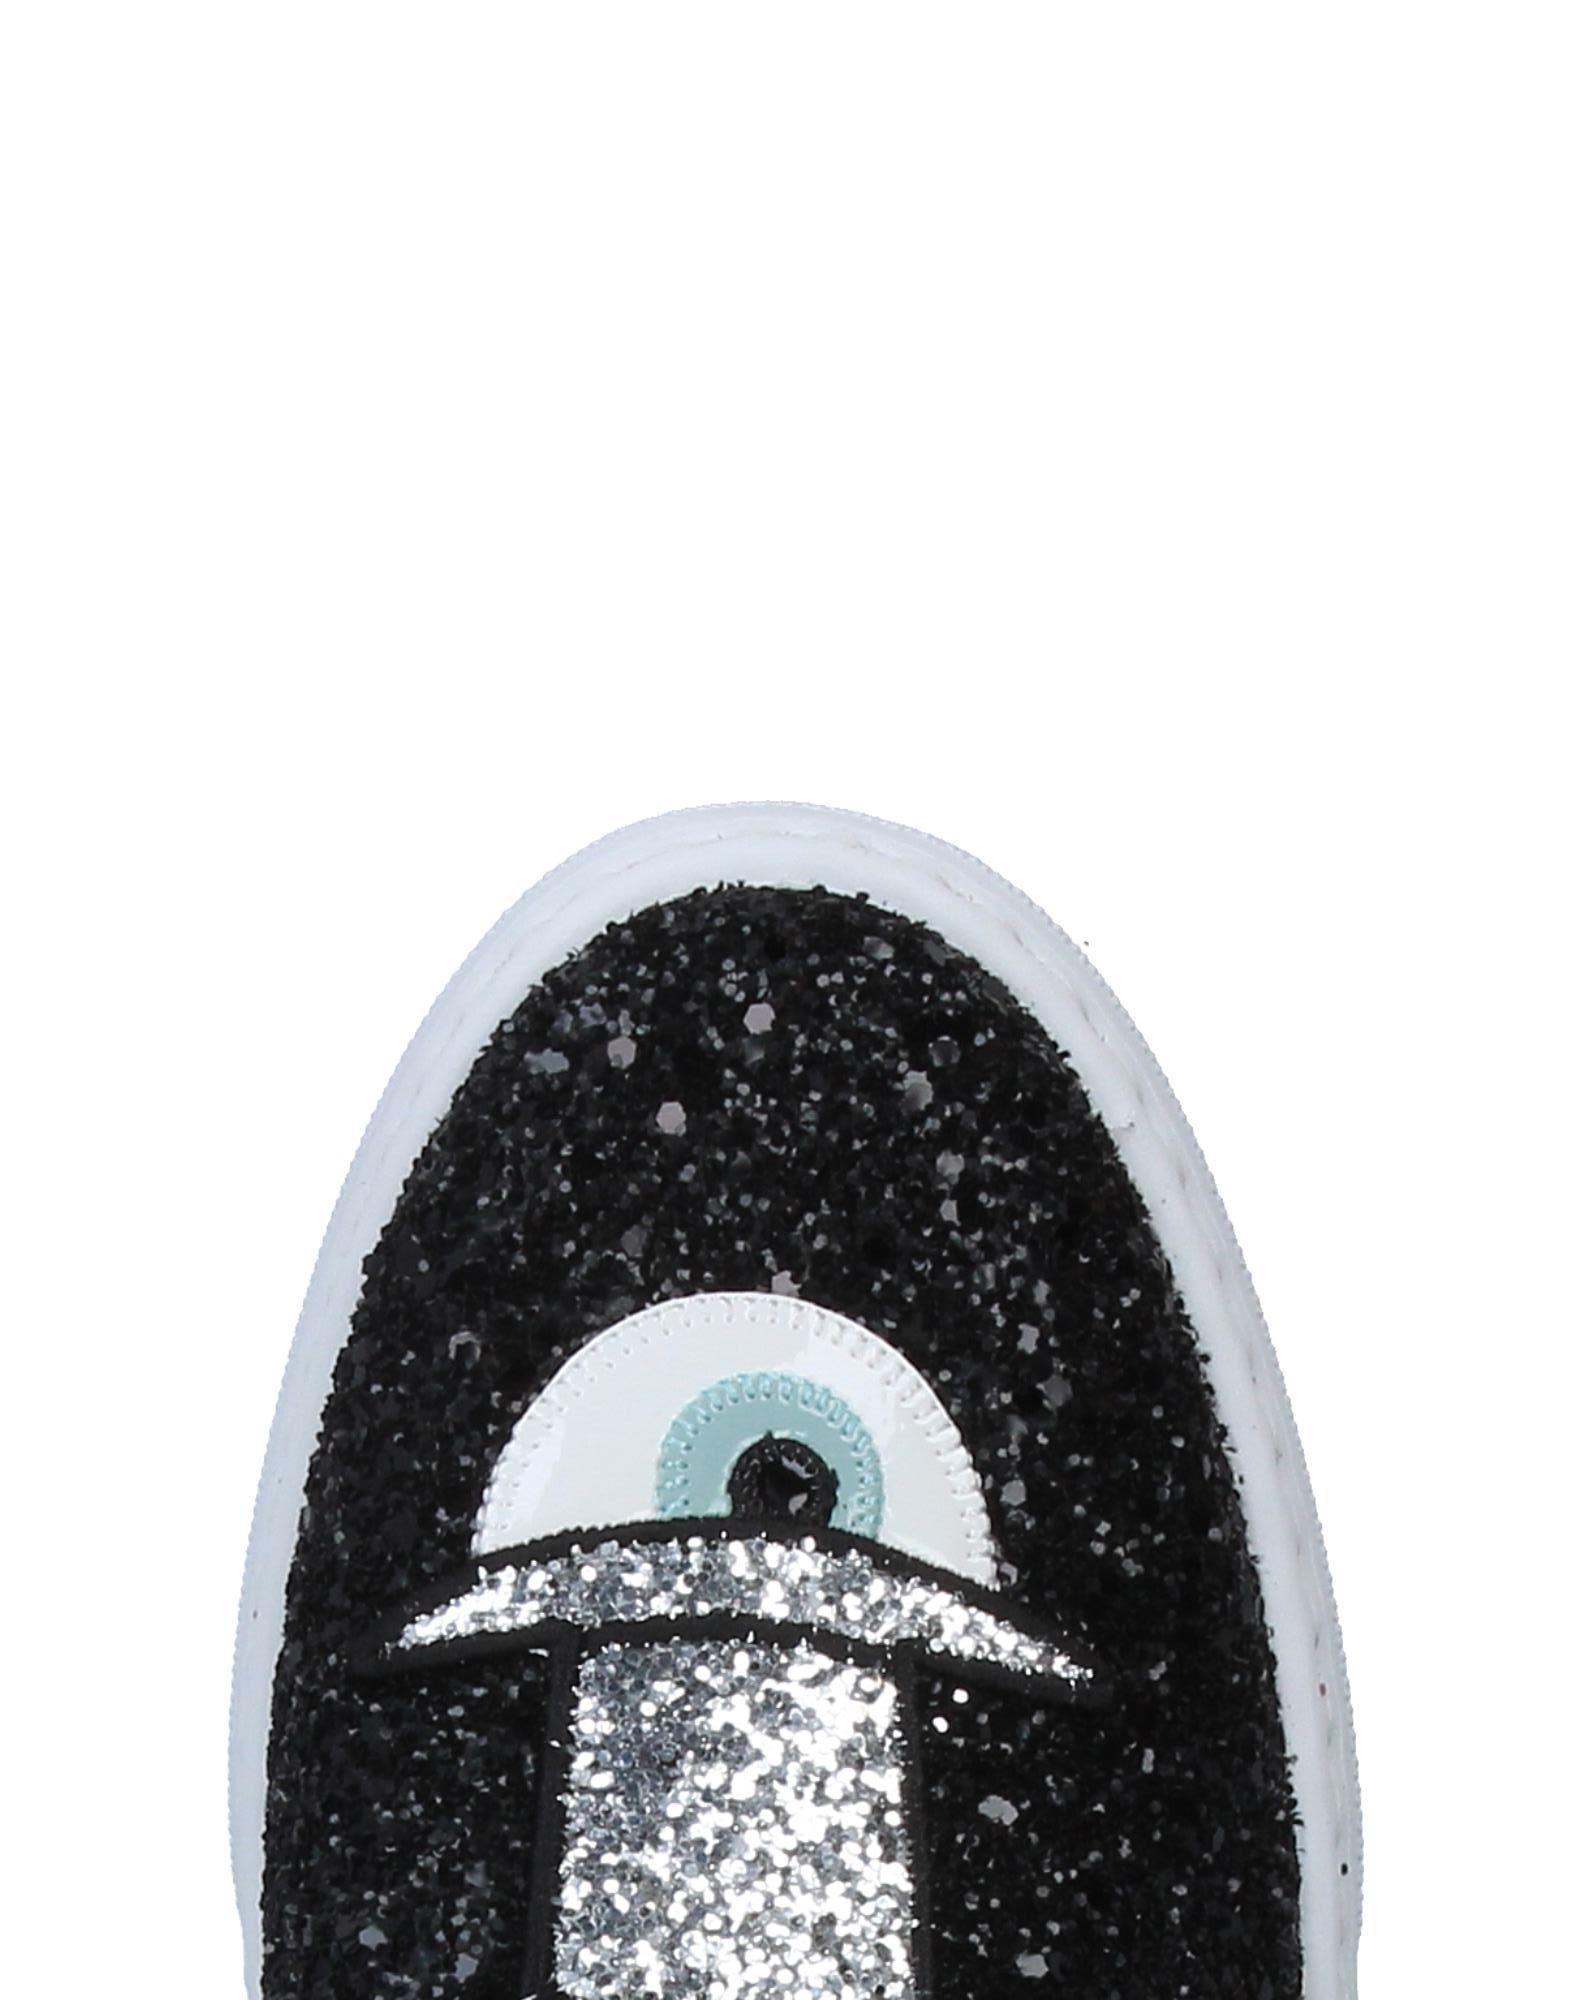 Chiara Ferragni Sneakers Sneakers Sneakers - Women Chiara Ferragni Sneakers online on  Canada - 11339528OI 78e857